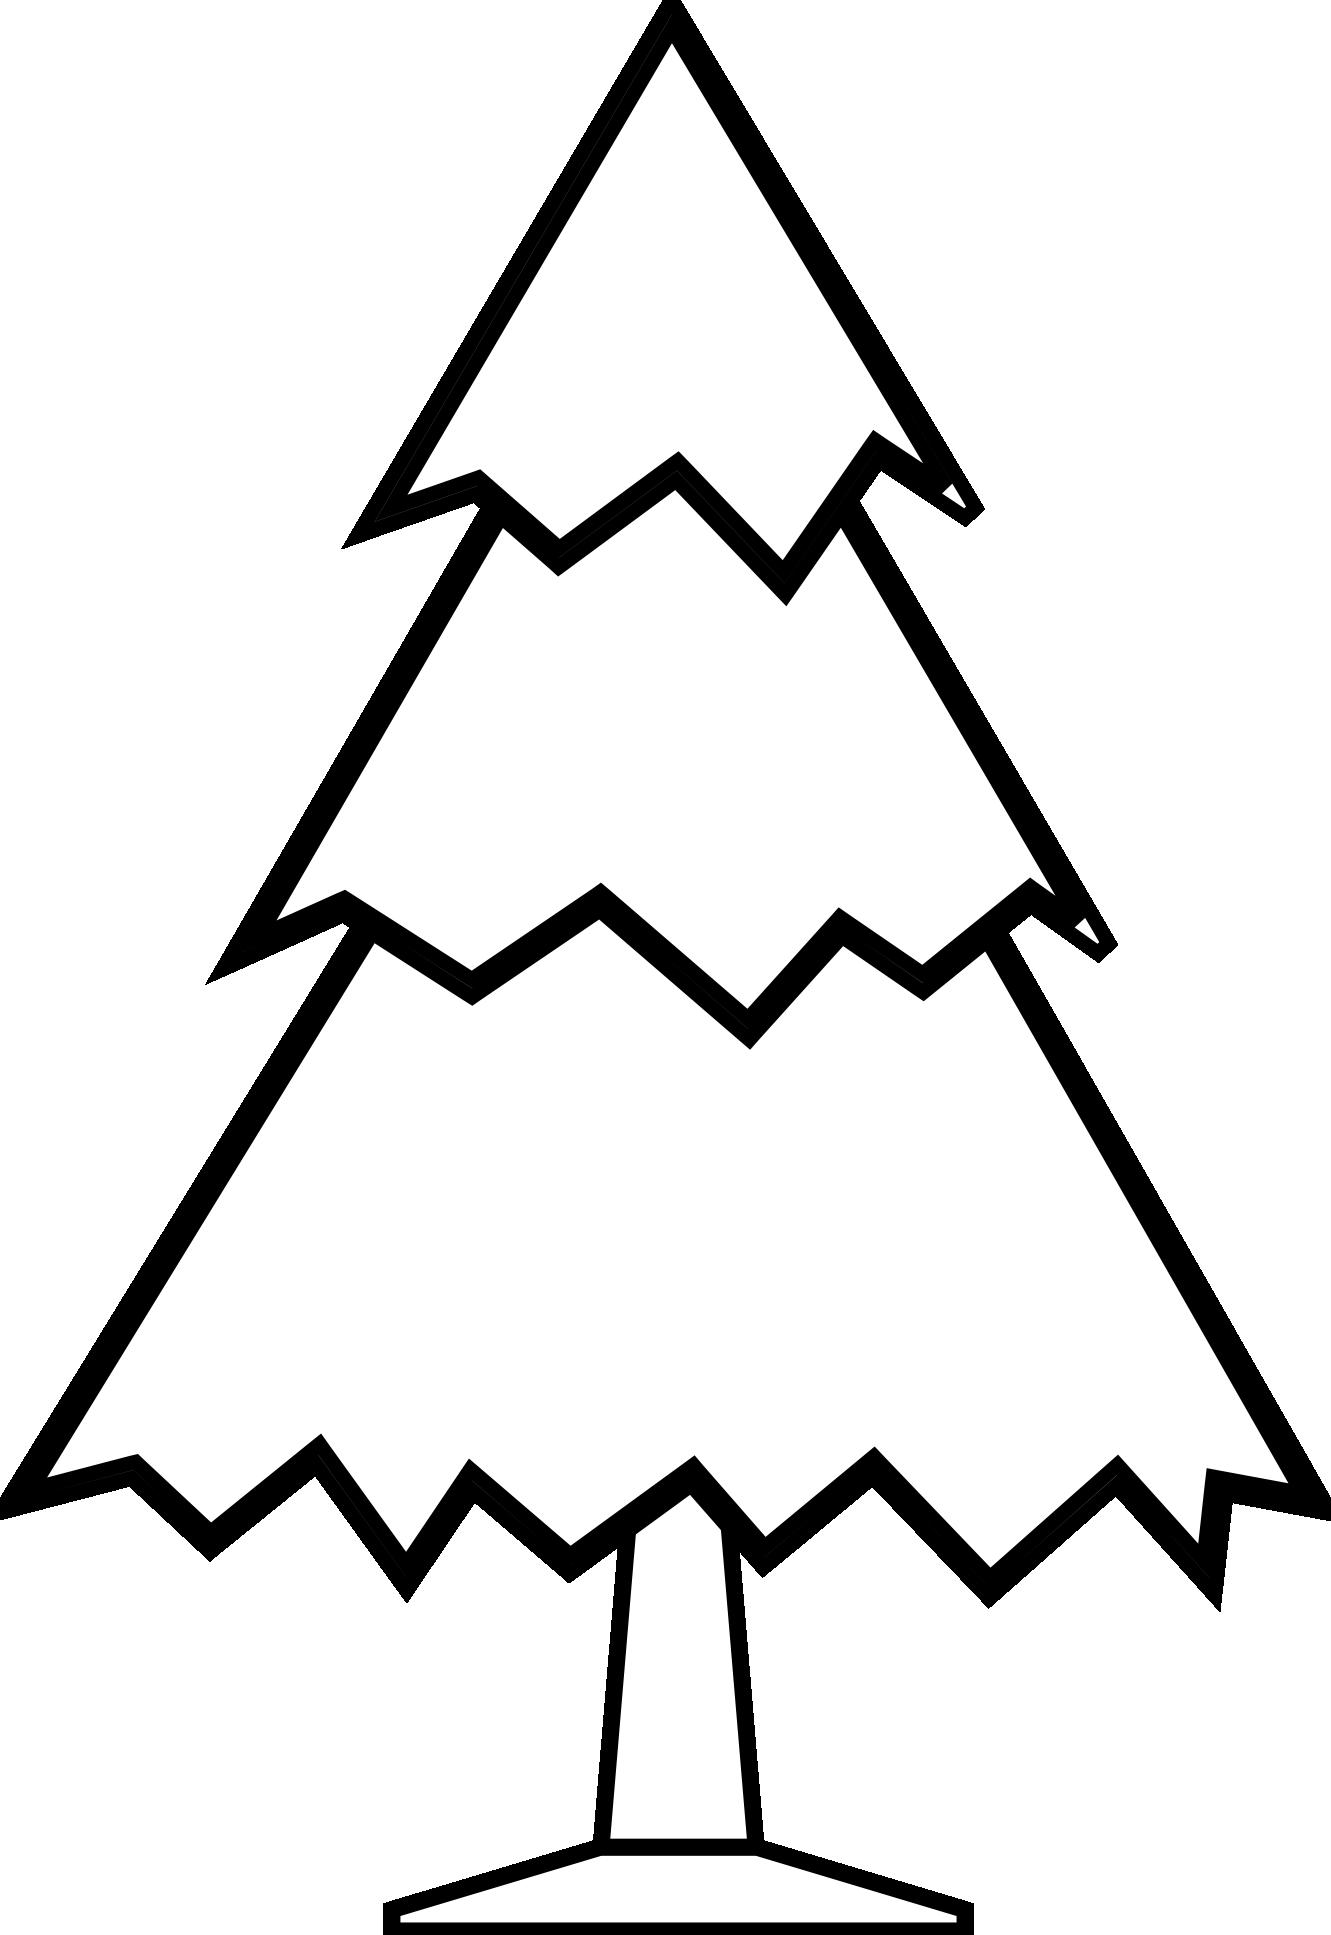 Christmas tree lighting black and white clipart clip freeuse download Free Christmas Tree Black And White Clipart, Download Free Clip Art ... clip freeuse download